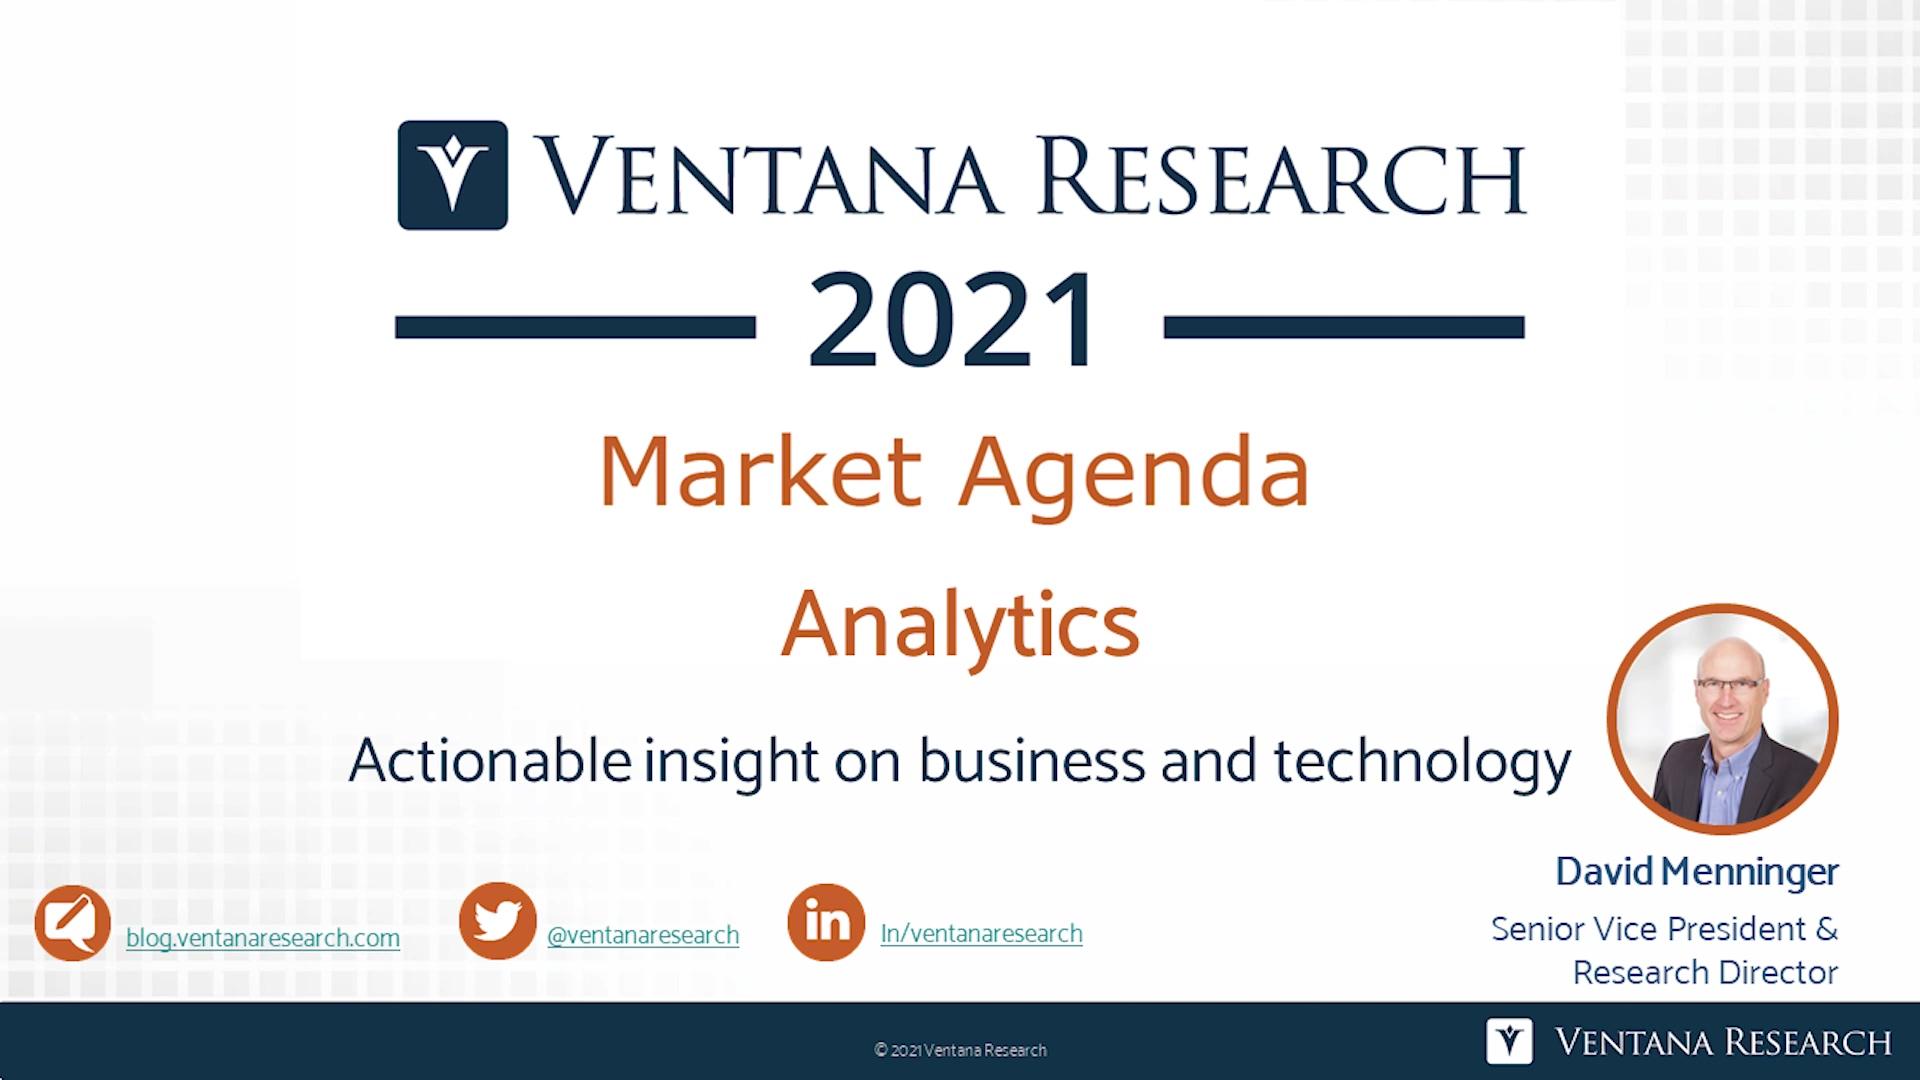 Ventana Research 2021 Market Agenda for Analytics